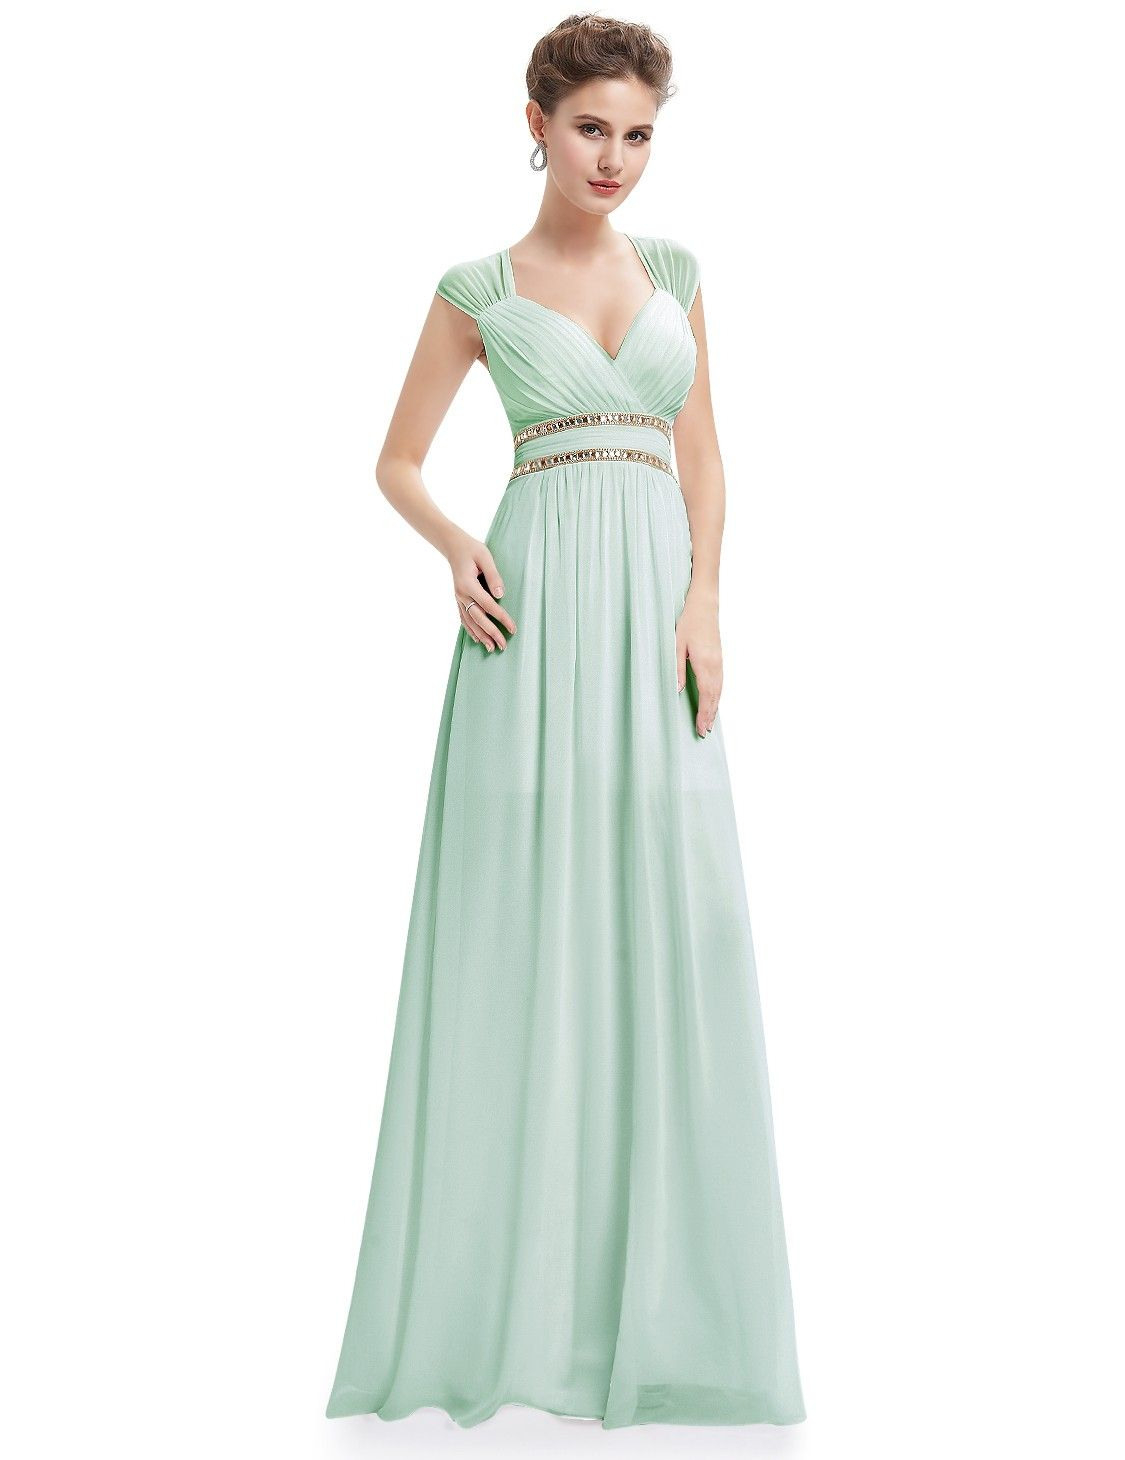 20 Schön Abendkleid Elegant Lang StylishDesigner Schön Abendkleid Elegant Lang für 2019